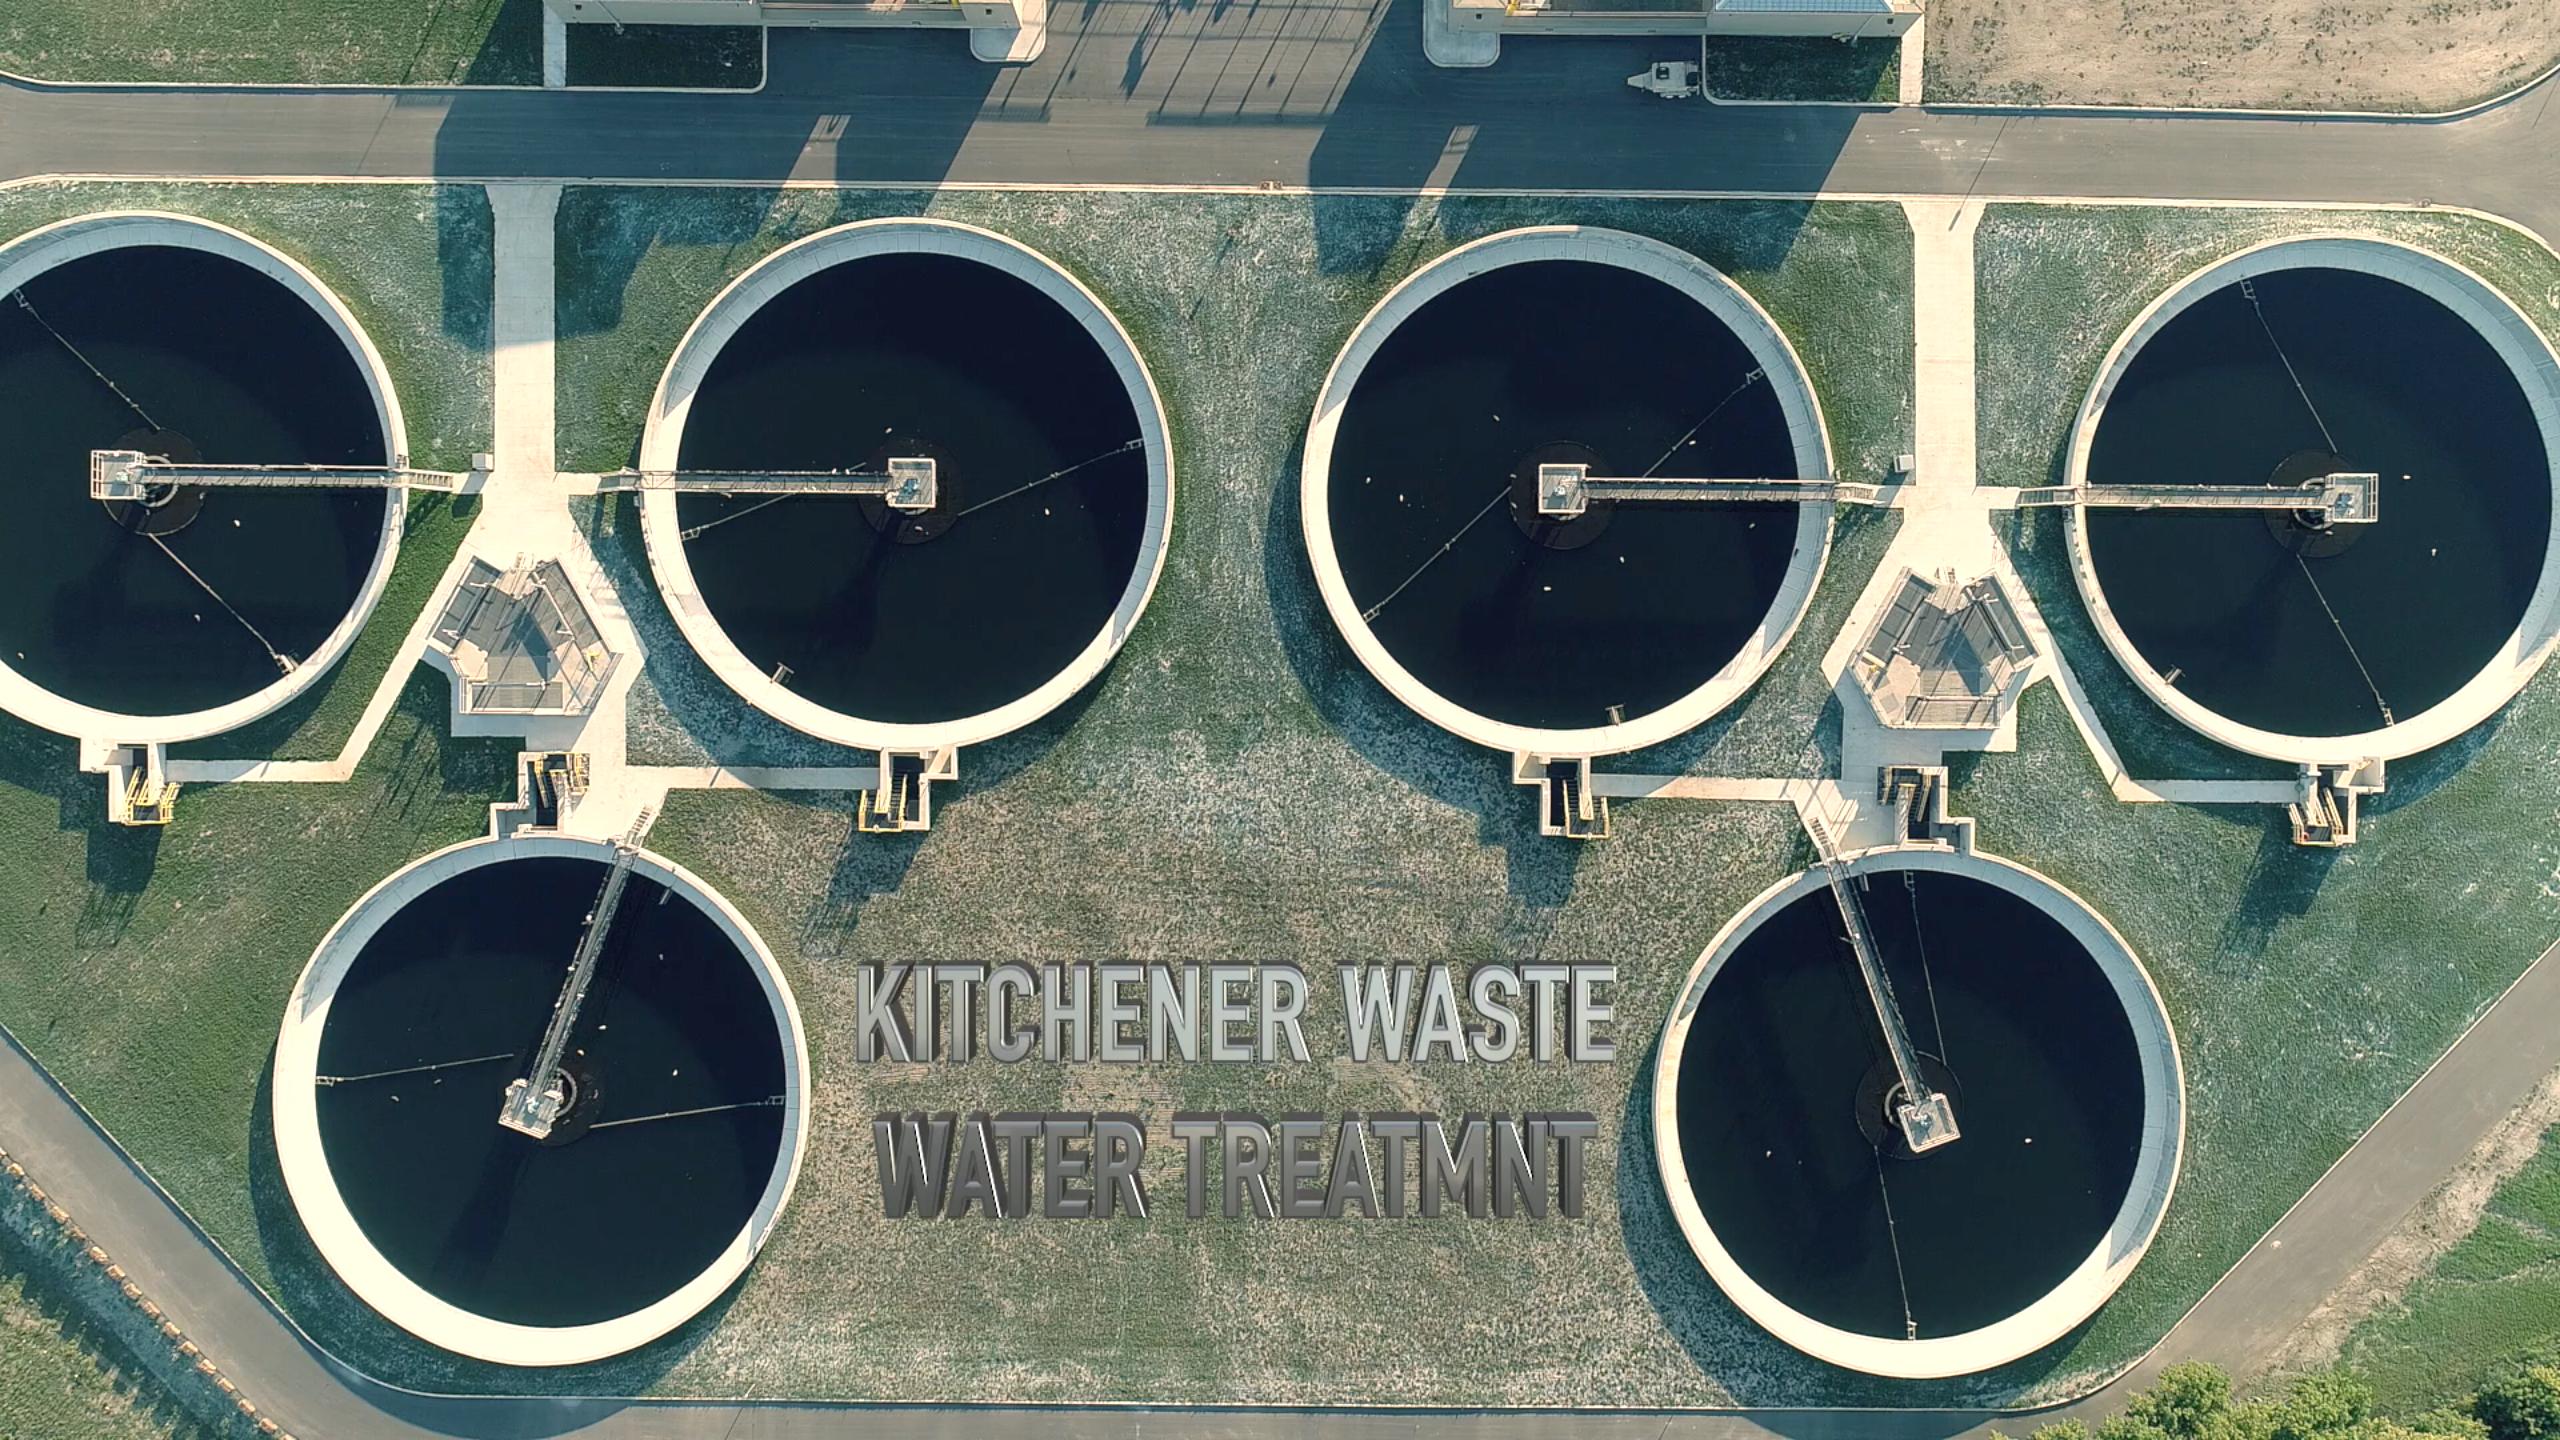 Kitchener Water Treatment